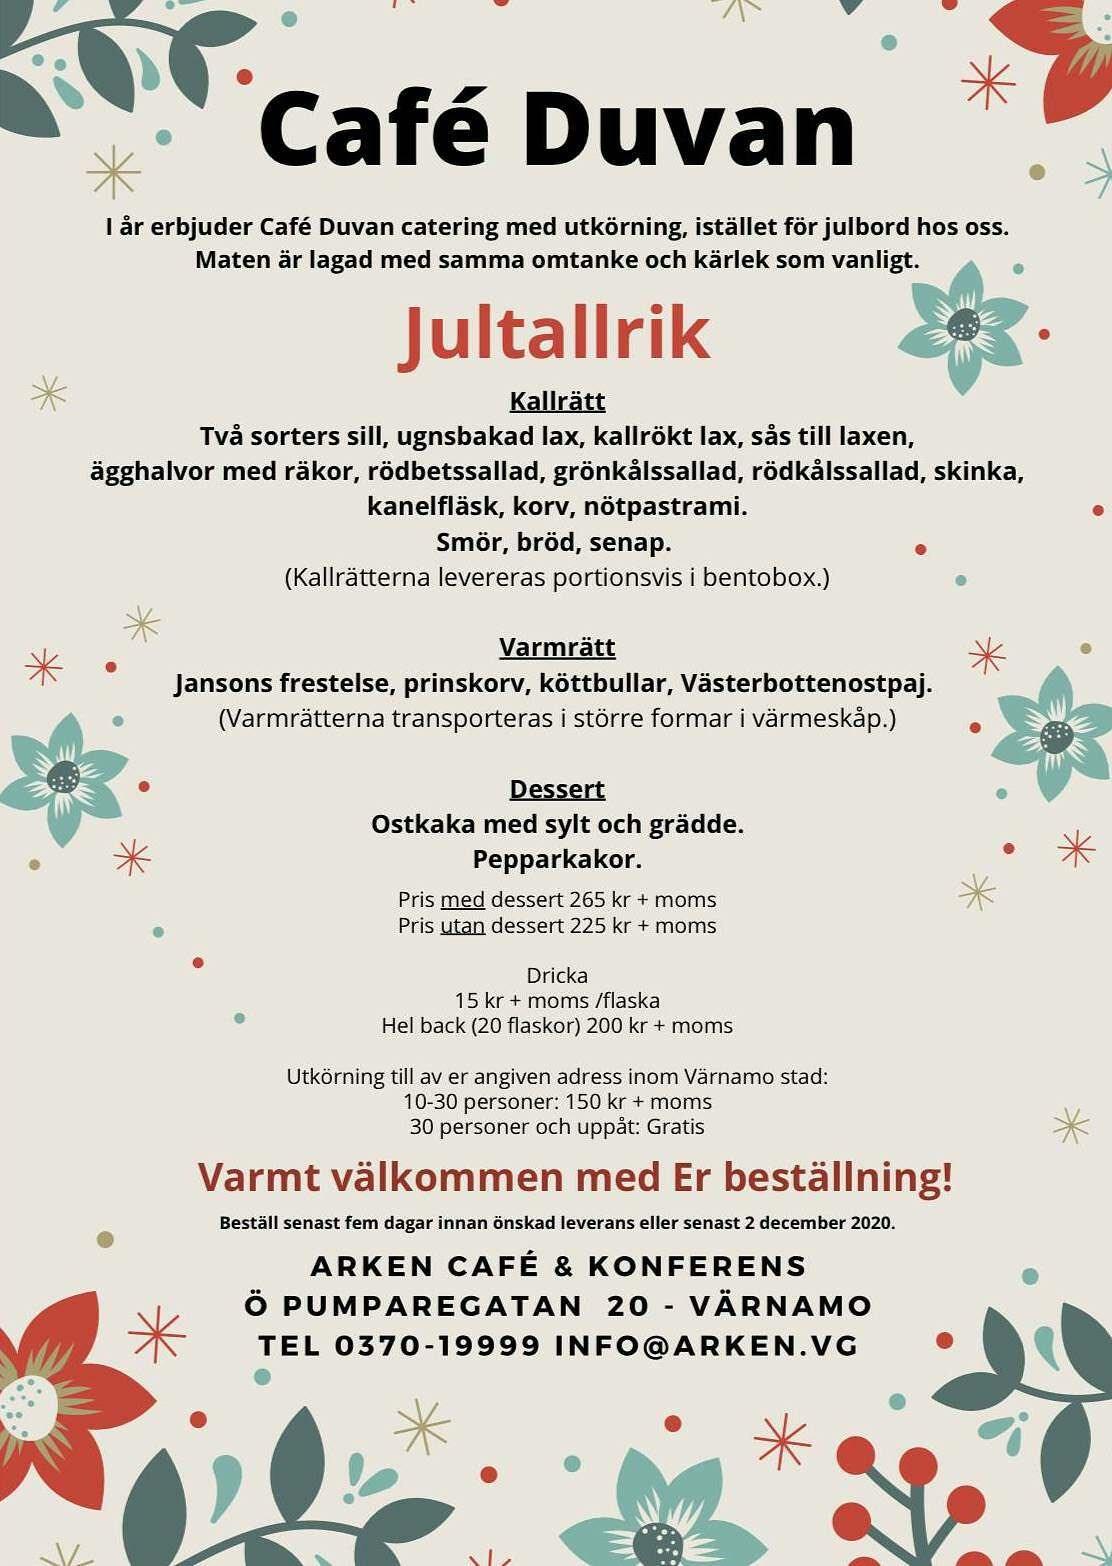 cafe-duvan-catering-jul1